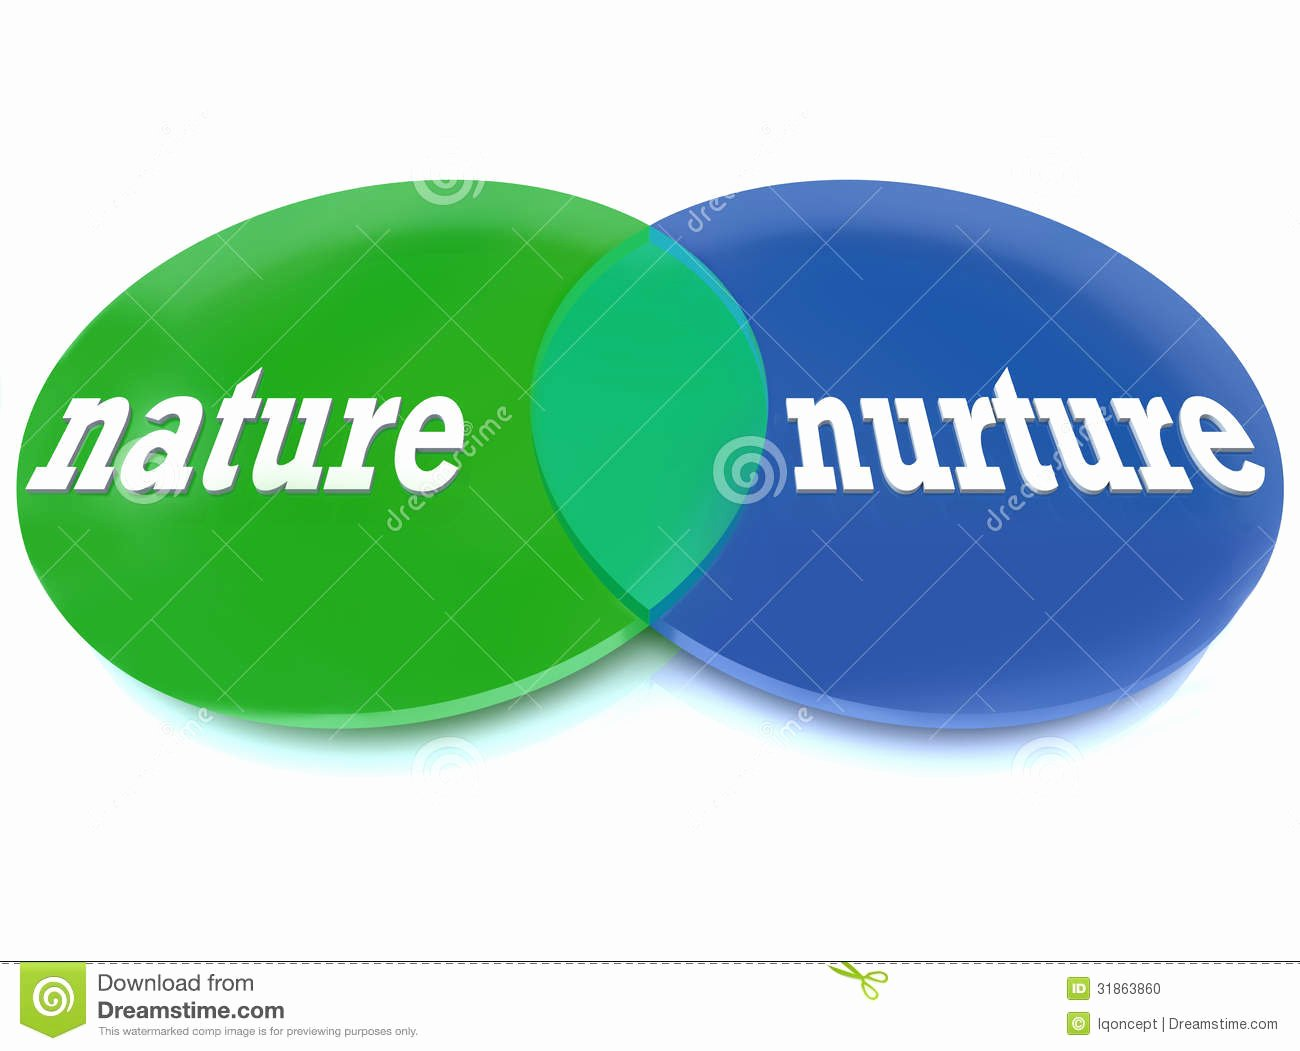 Nature Vs Nurture Venn Diagram Beautiful Nature Vs Nurture Venn Diagram Stock Image